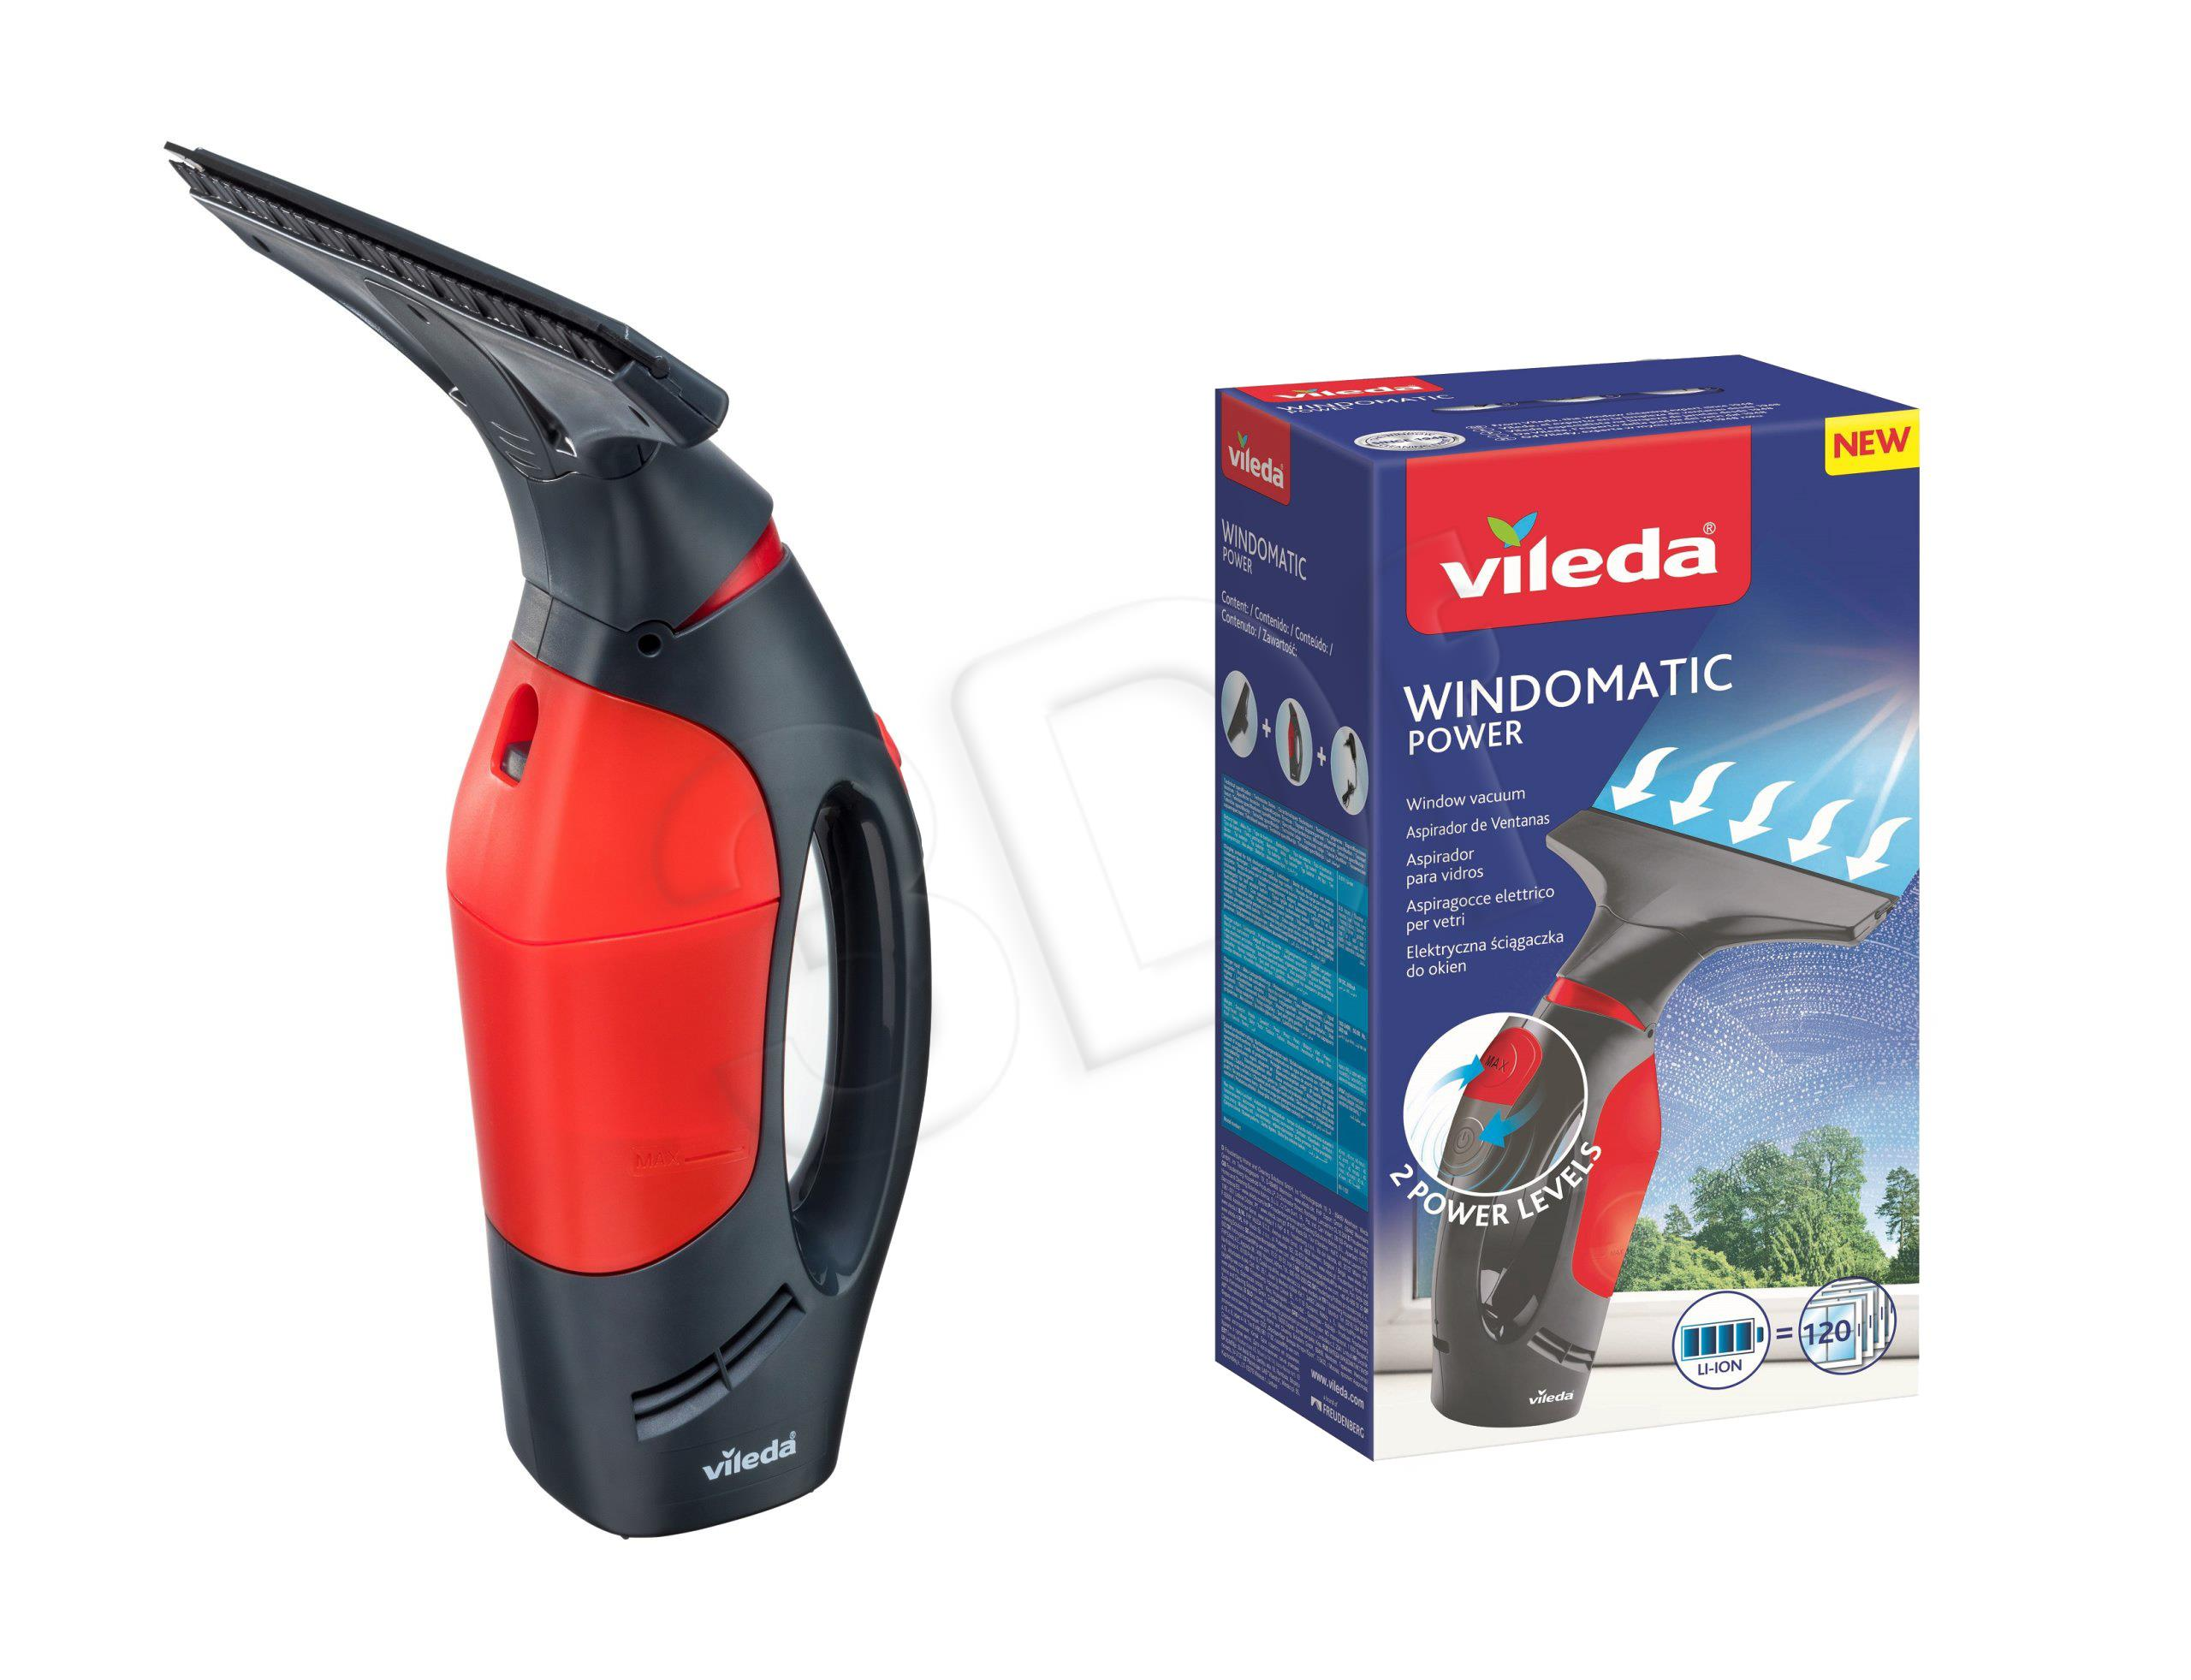 Windomatic Power washer for windows 153230 tīrīšanas līdzeklis